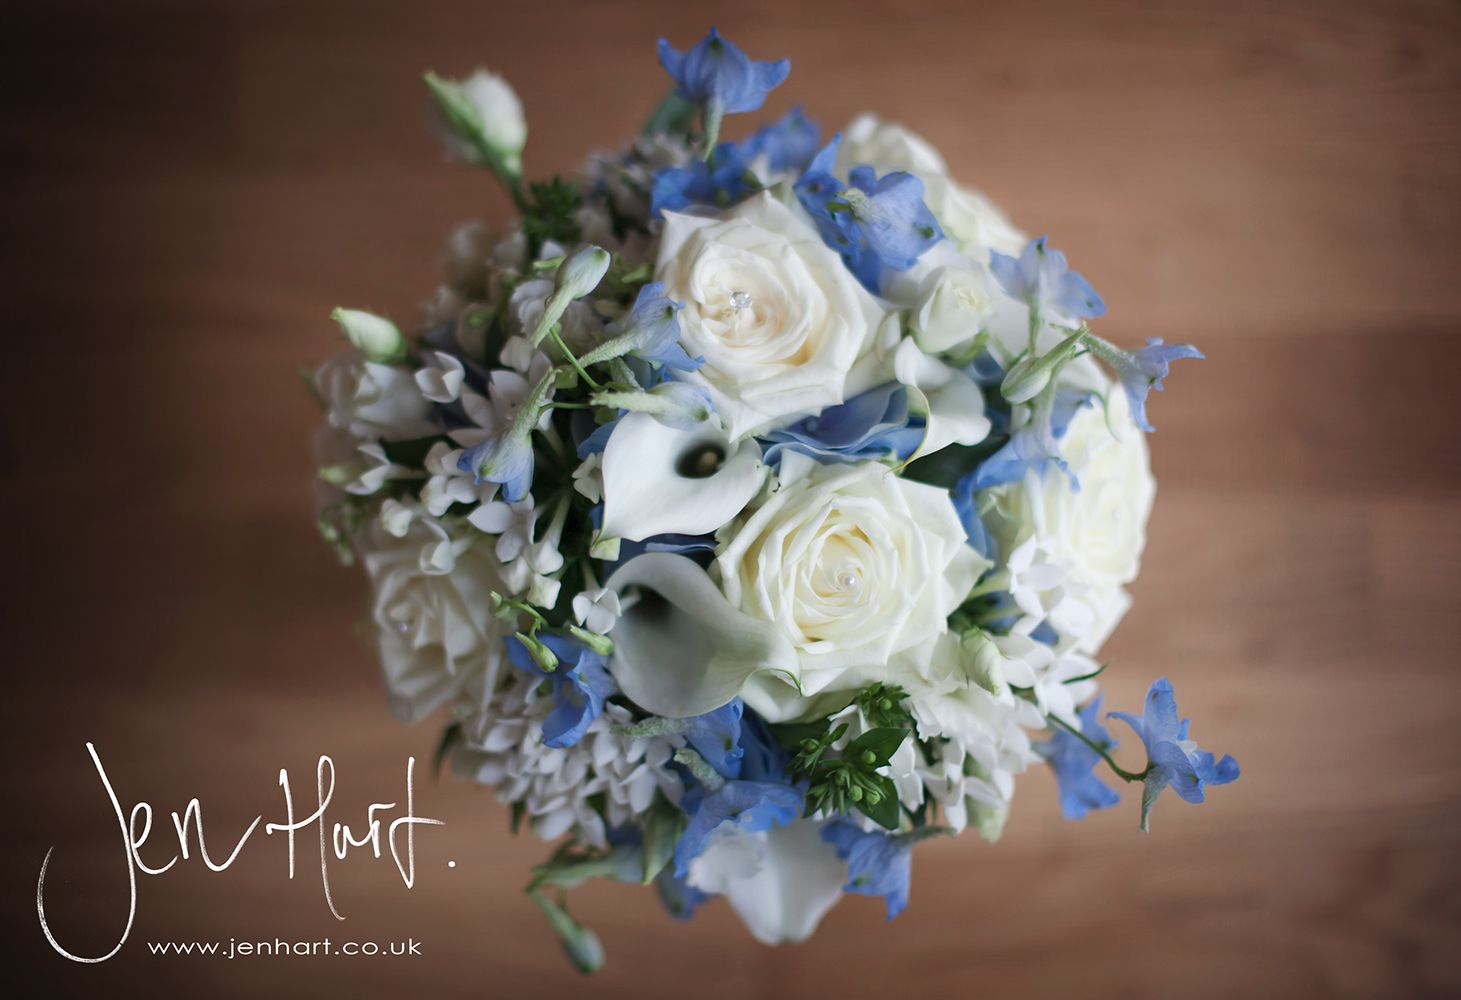 Picture-Wedding-Hardwick-Hall-Sedgefield-SMJ14-005